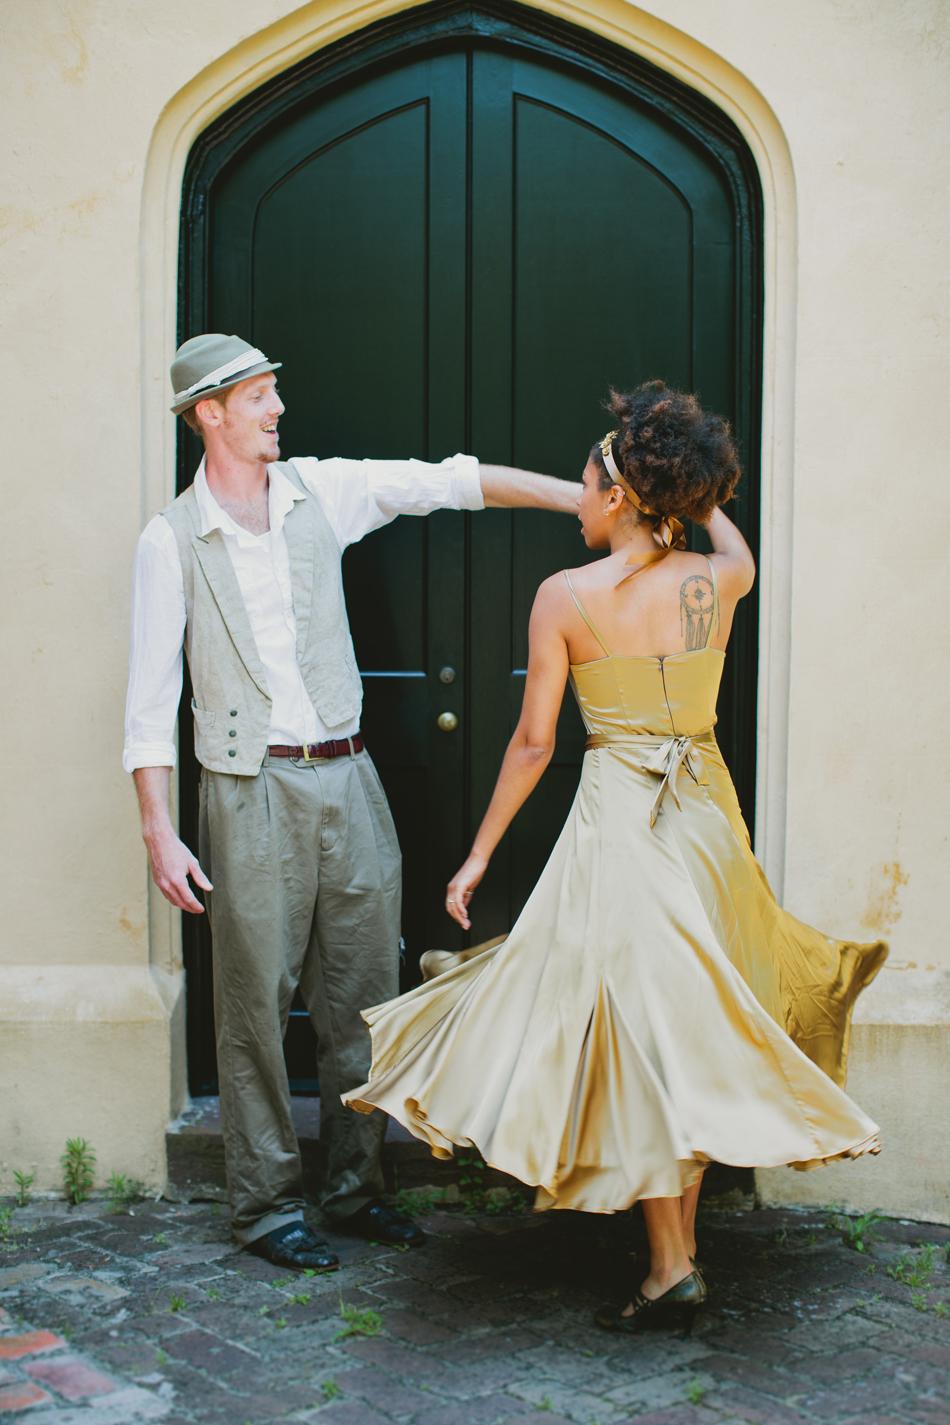 Jameykay_arlie_bohemian_elopement_styled_shoot013.jpg